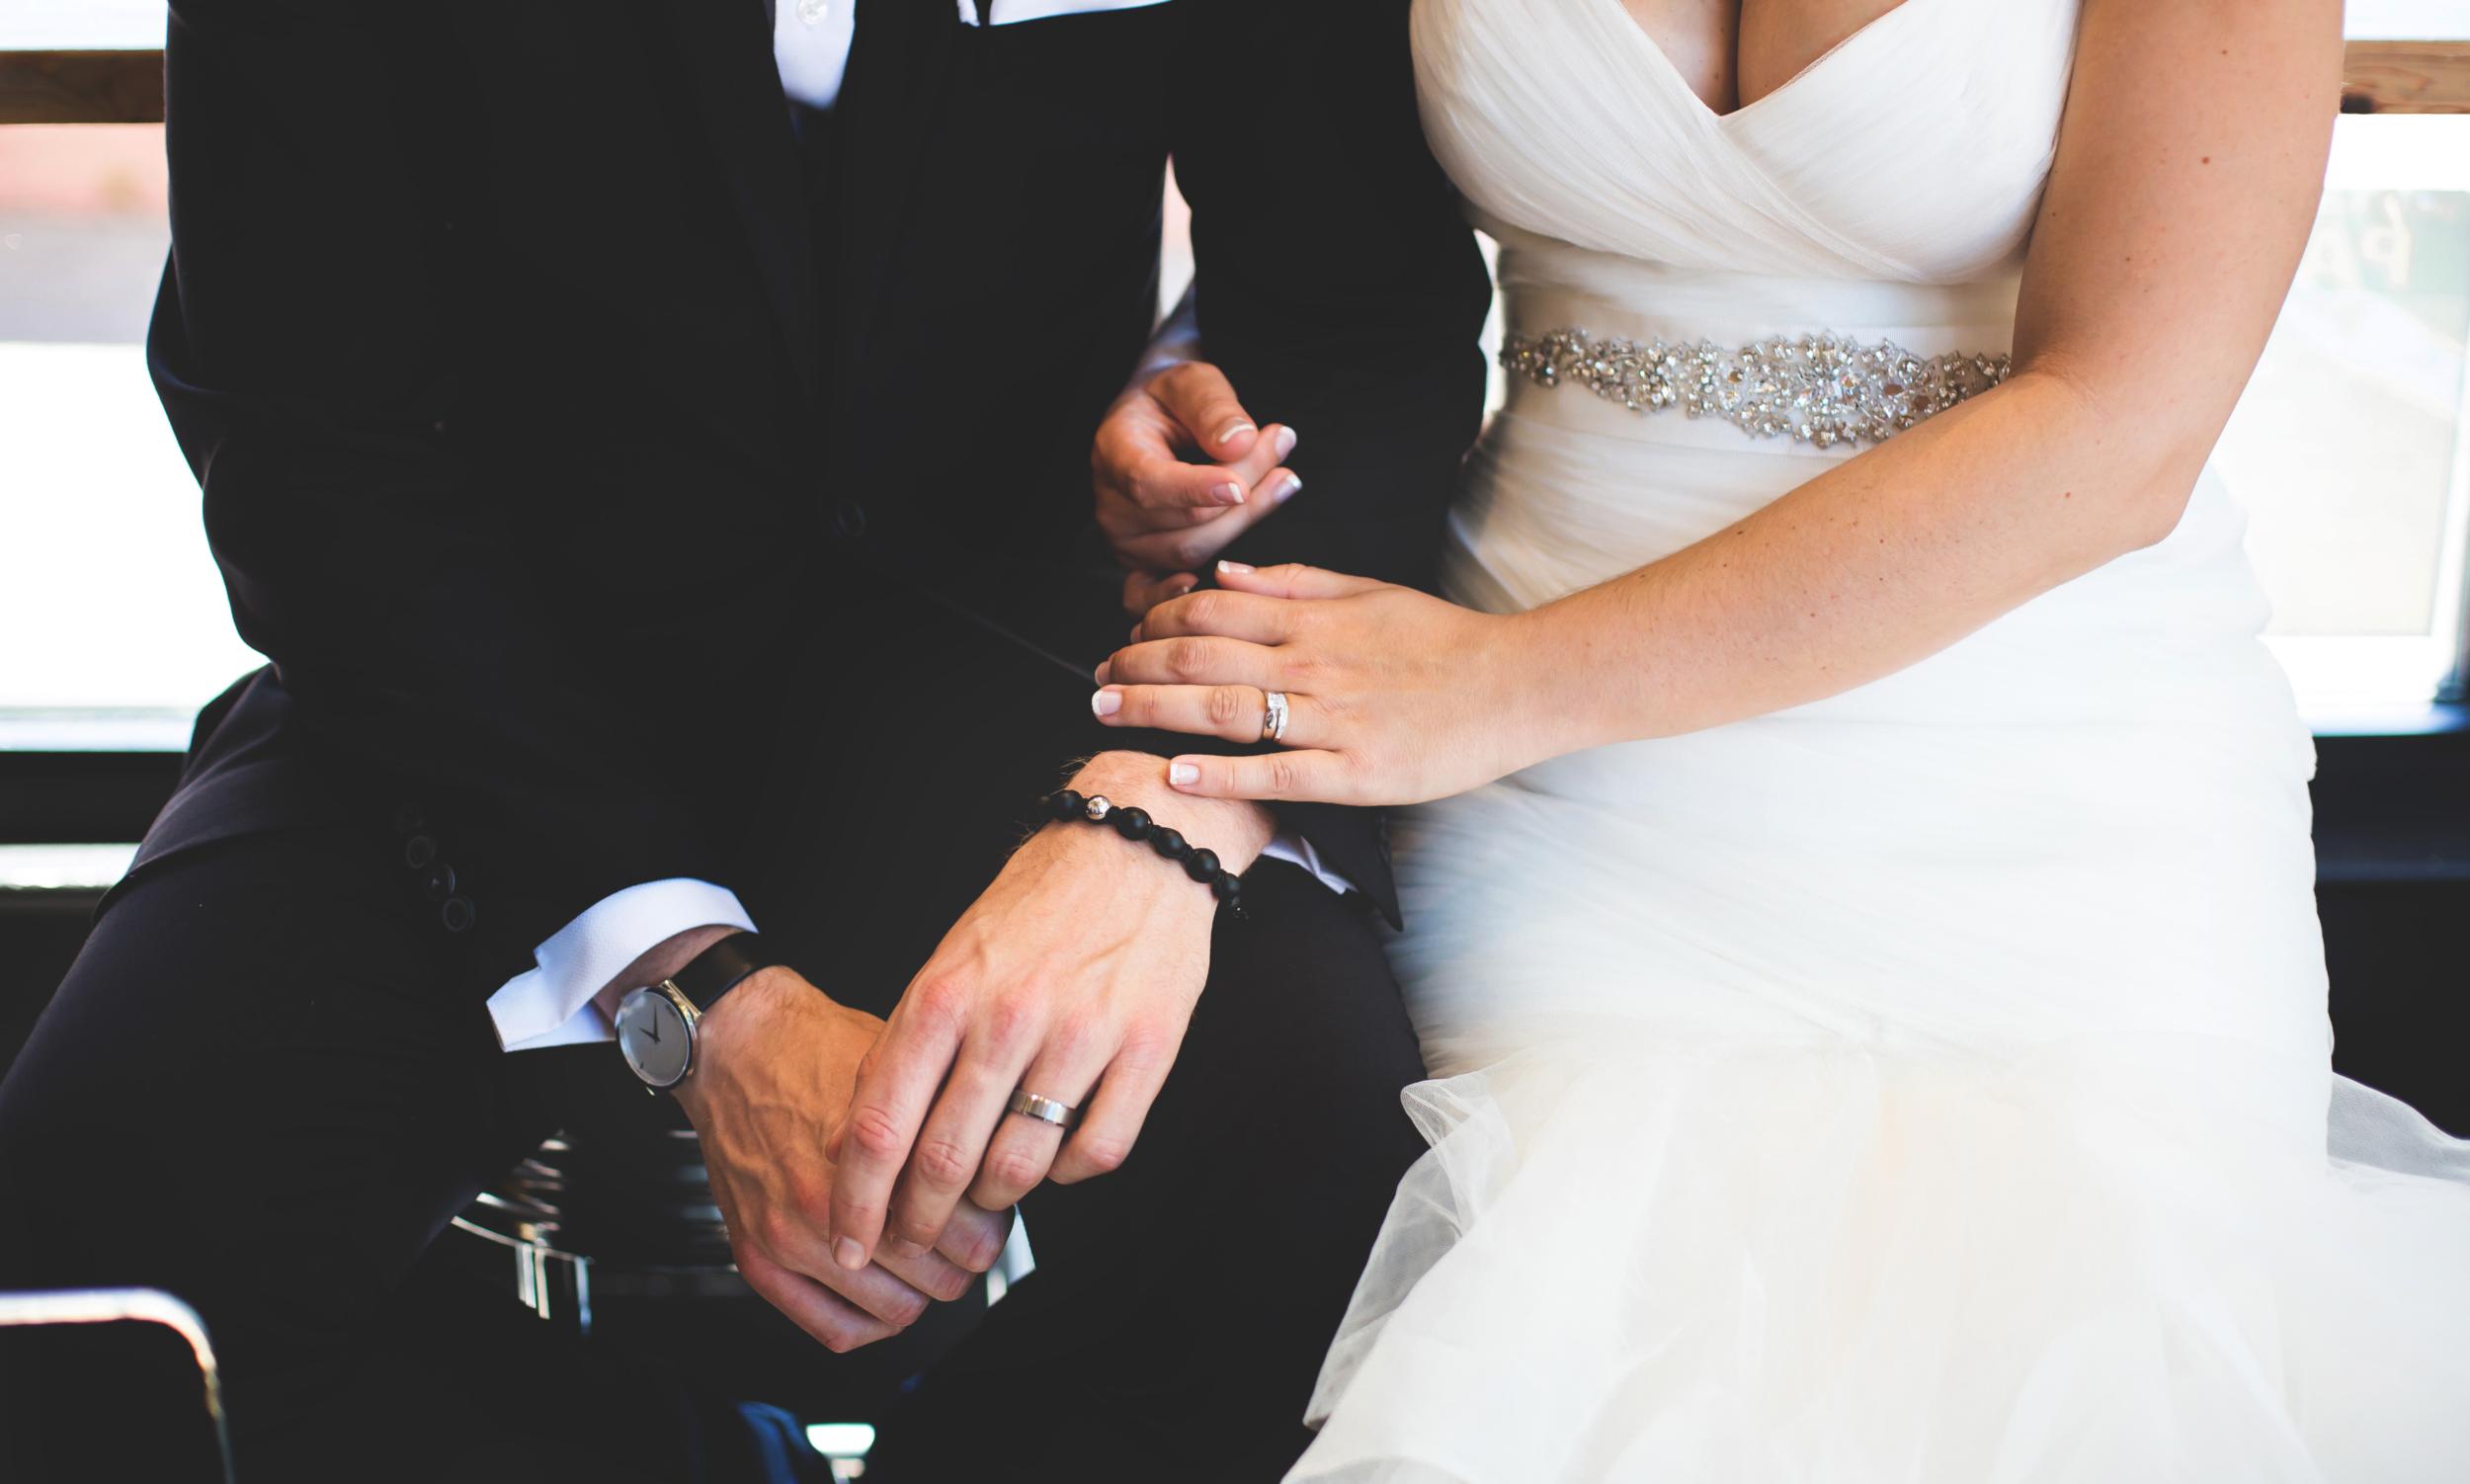 Wedding-Harbour-Banquet-Center-Oakville-Photographer-Wedding-Hamilton-Saint-James-Espresso-Downtown-HamOnt-GTA-Niagara-Toronto-Moments-by-Lauren-Photography-Photo-Image-25.png